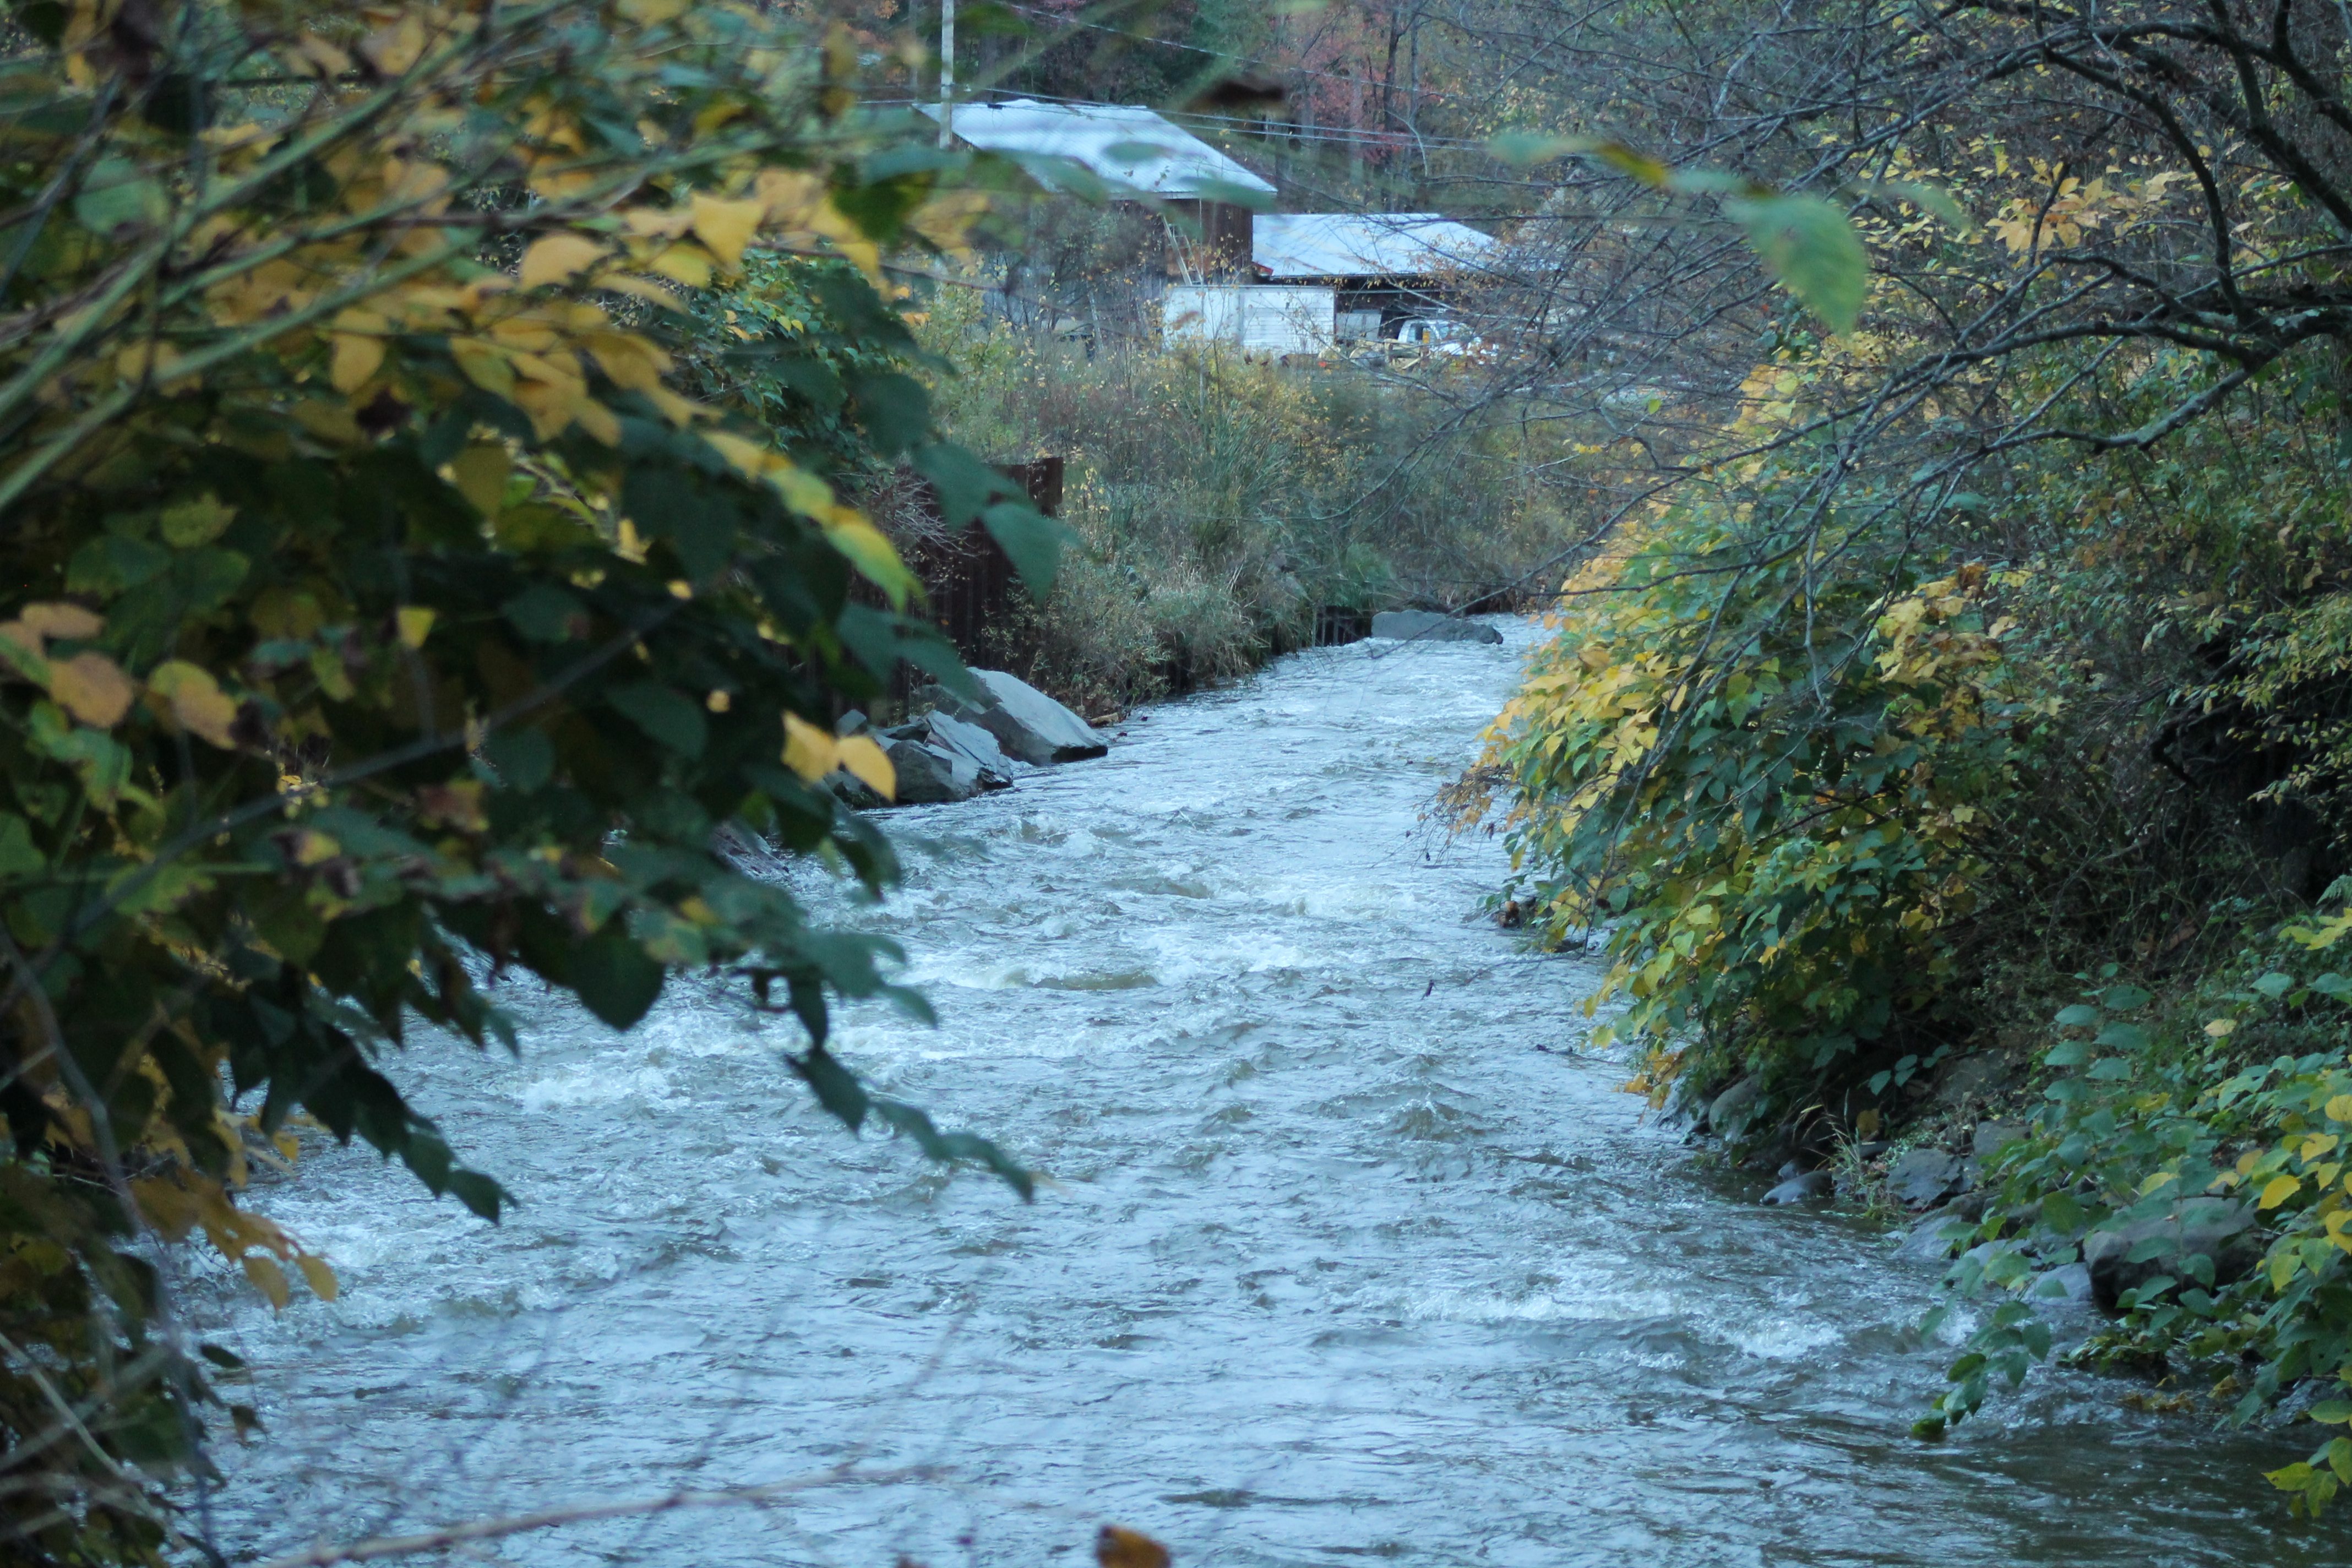 IMG_9884 down creek